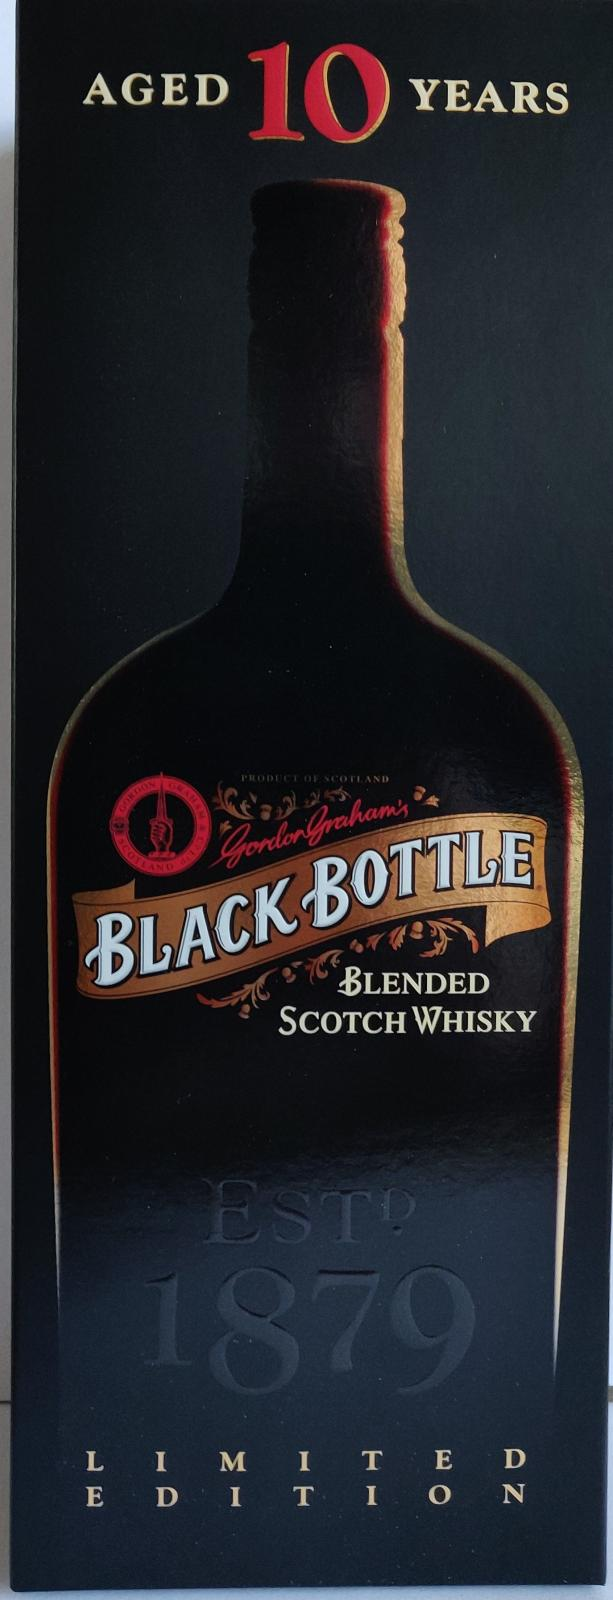 Black Bottle 10-year-old